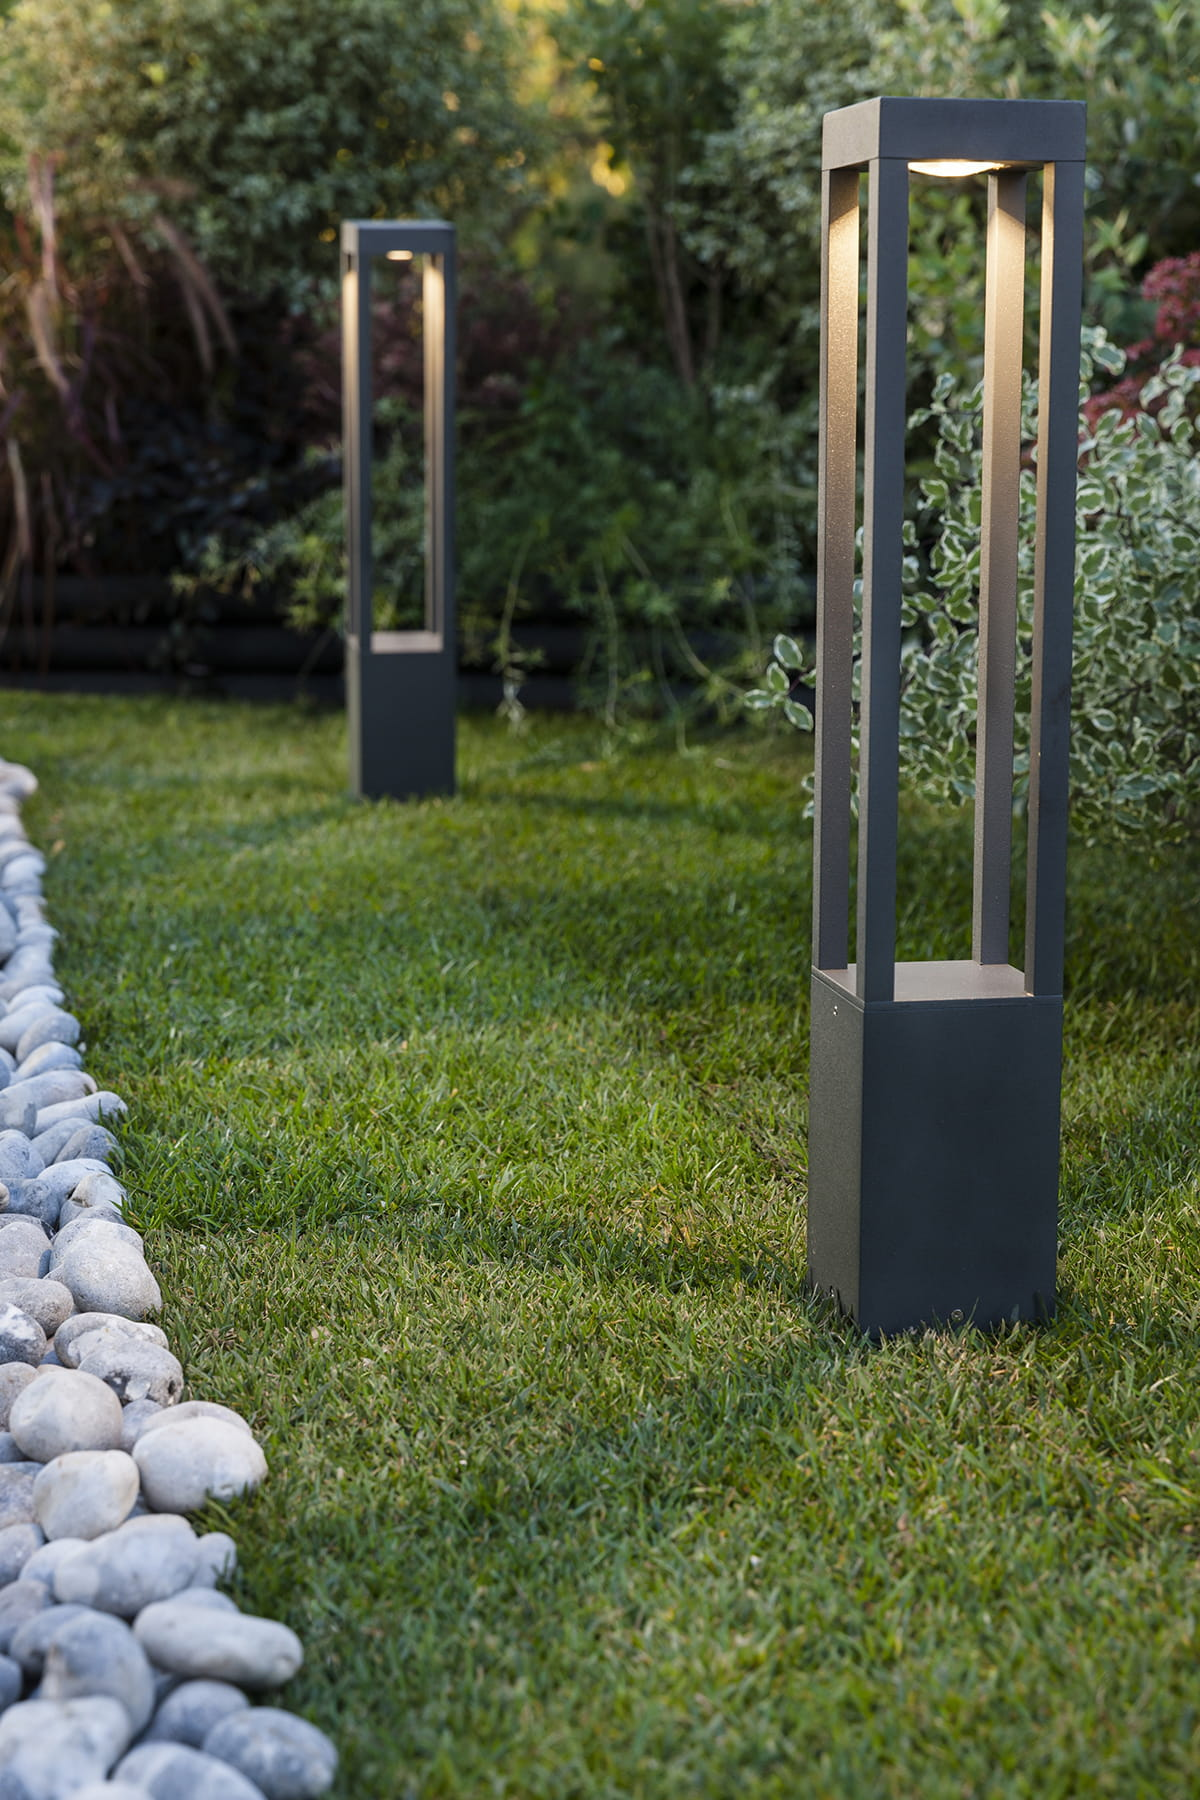 une borne de lumi re diffuse clairage de jardin 20 inspirations linternaute. Black Bedroom Furniture Sets. Home Design Ideas